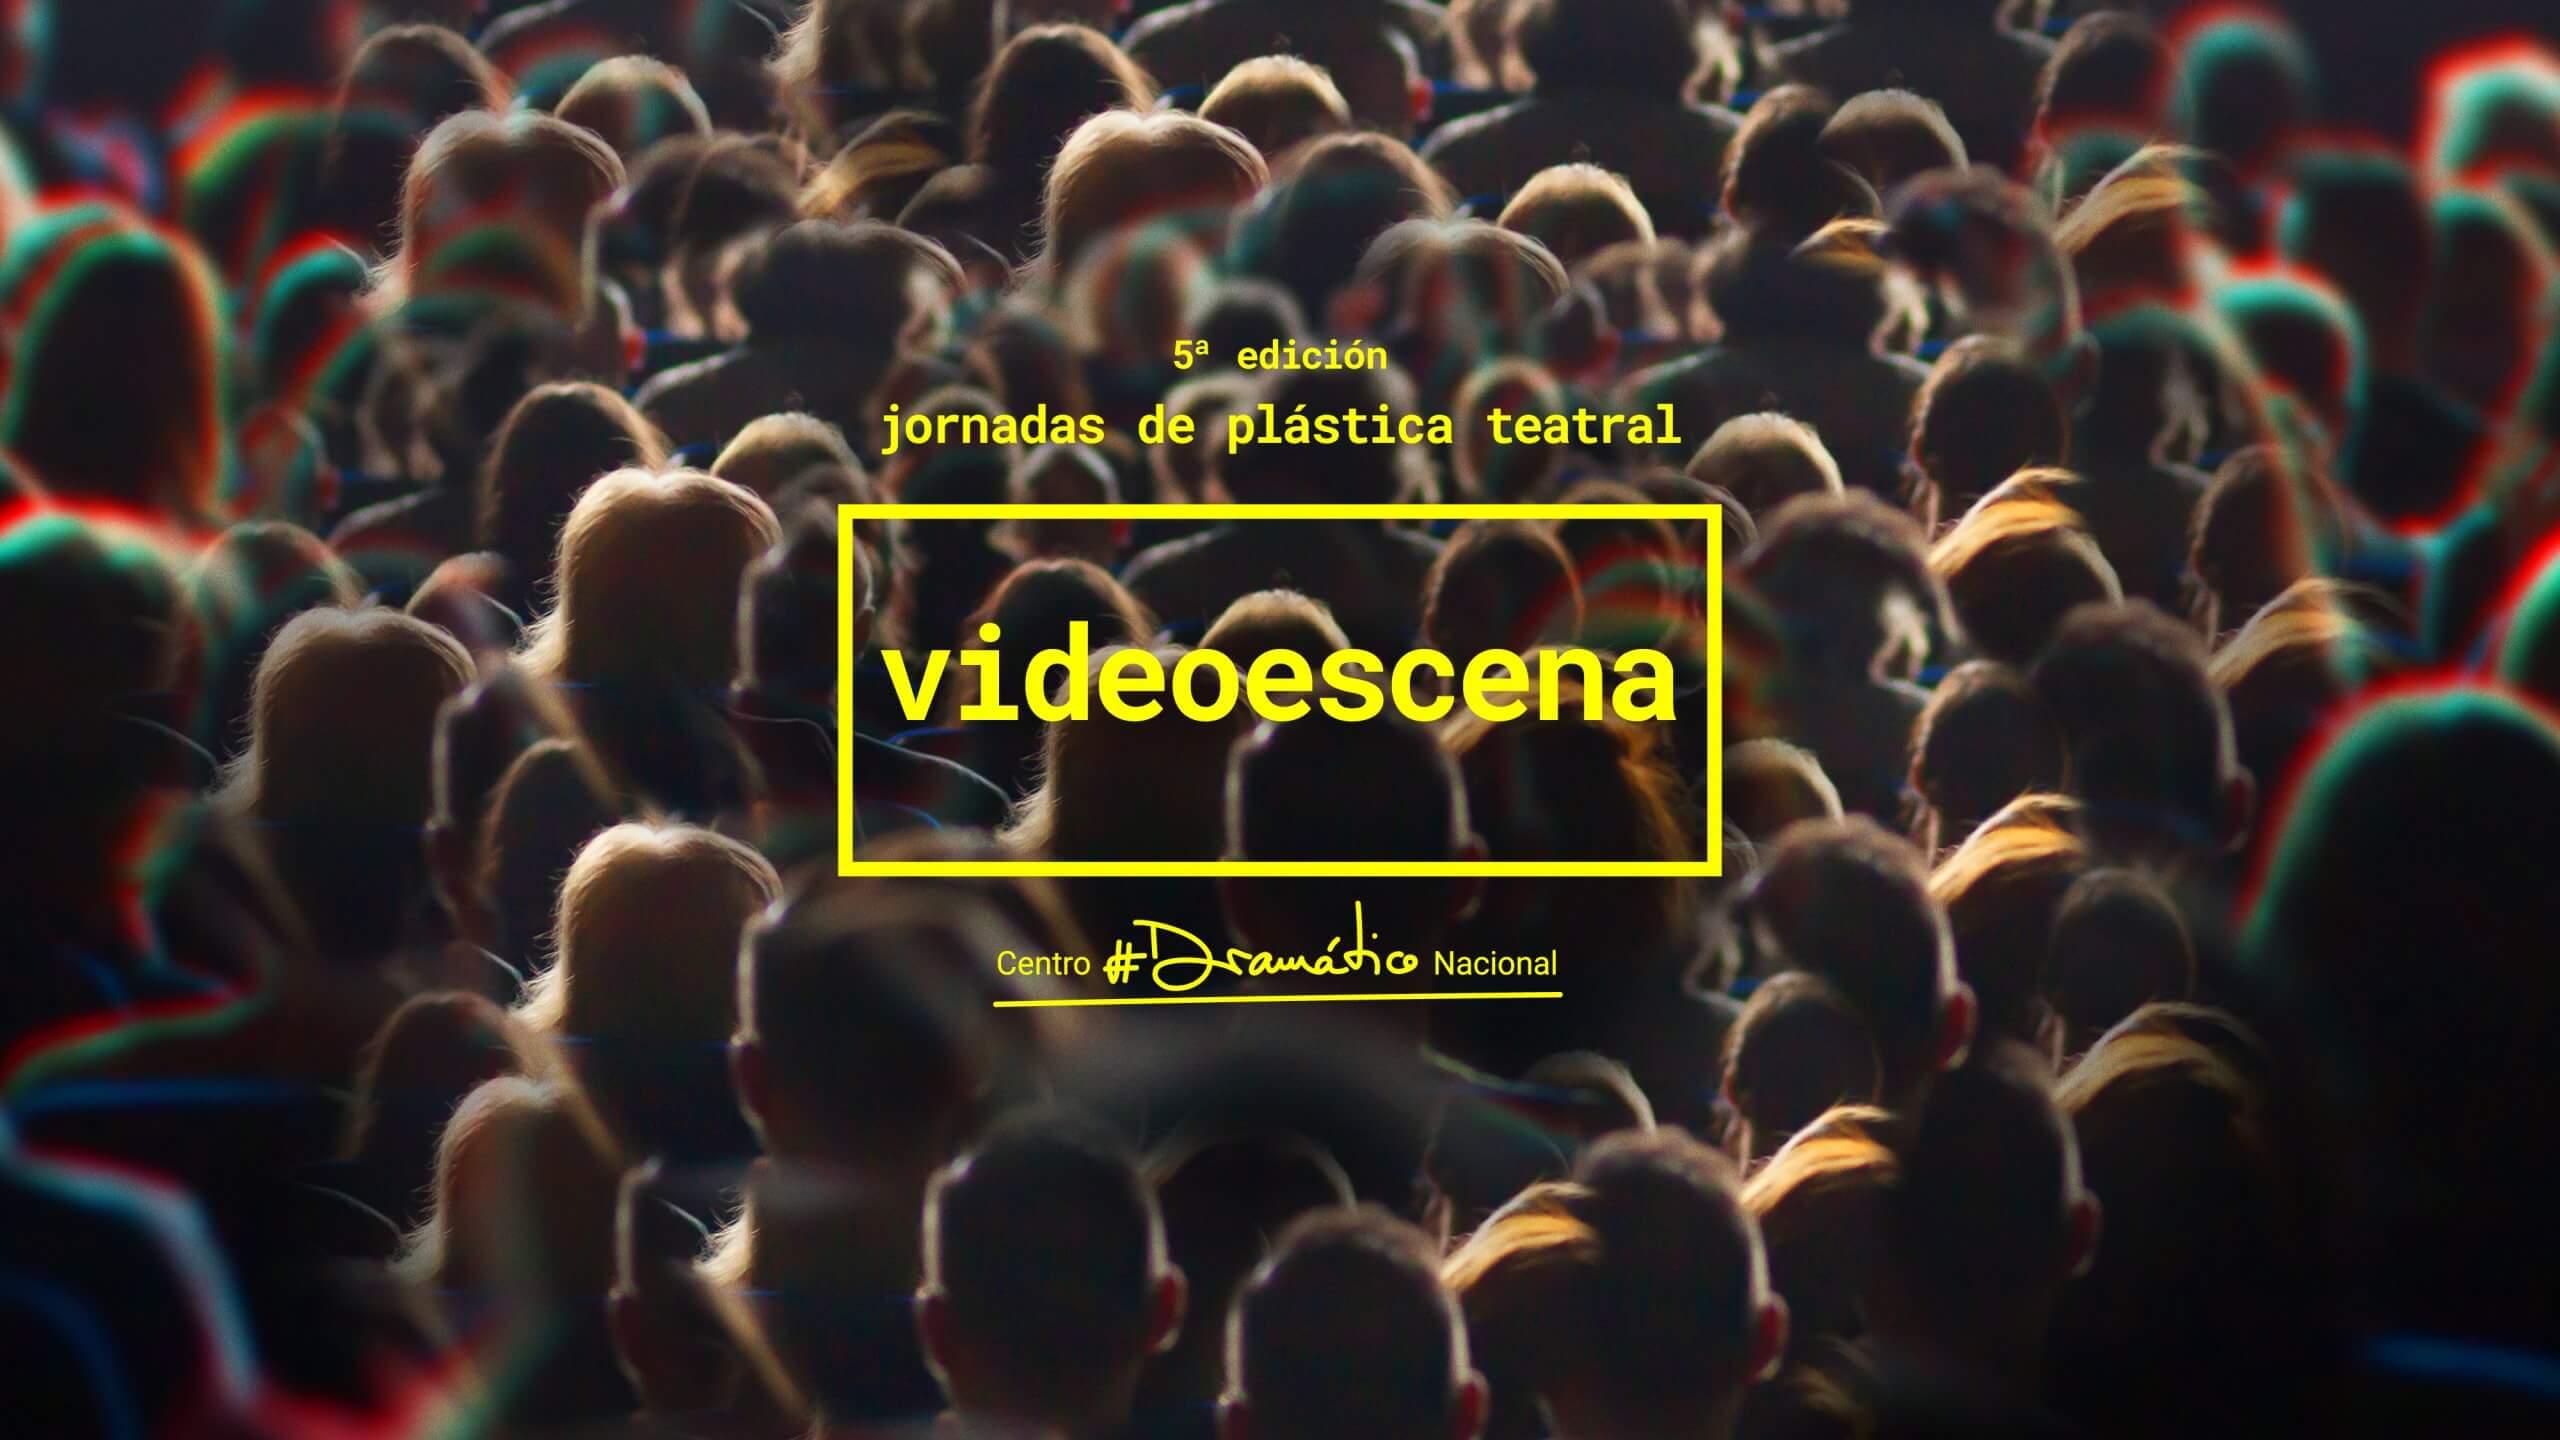 V Jornadas de Plástica Teatral. Videoescena - Centro Dramático Nacional